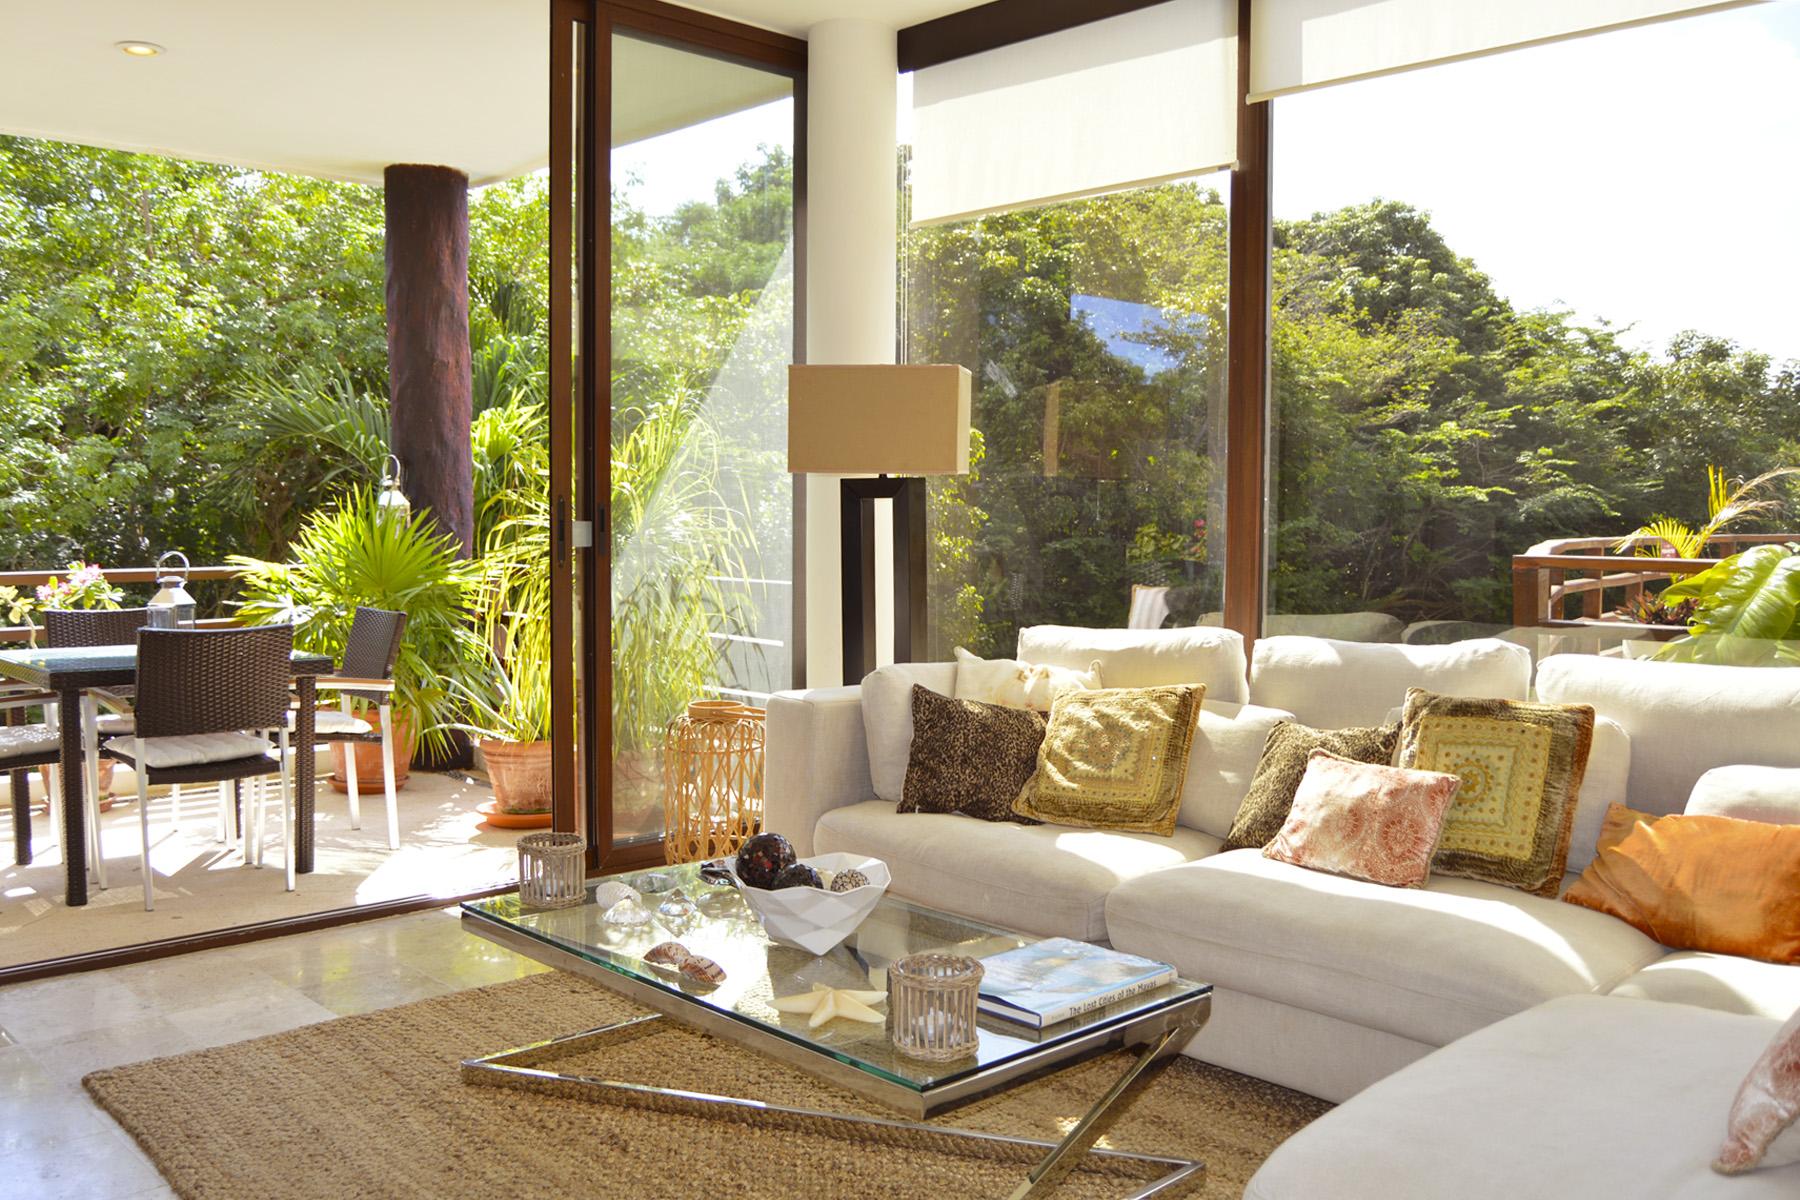 Apartamento por un Venta en AKOYA LUXURY CONDO Akoya, Villas Pakal Ret 3 Chichenitza Lot 19 Mza 16 Playa Del Carmen, Quintana Roo, 77710 México